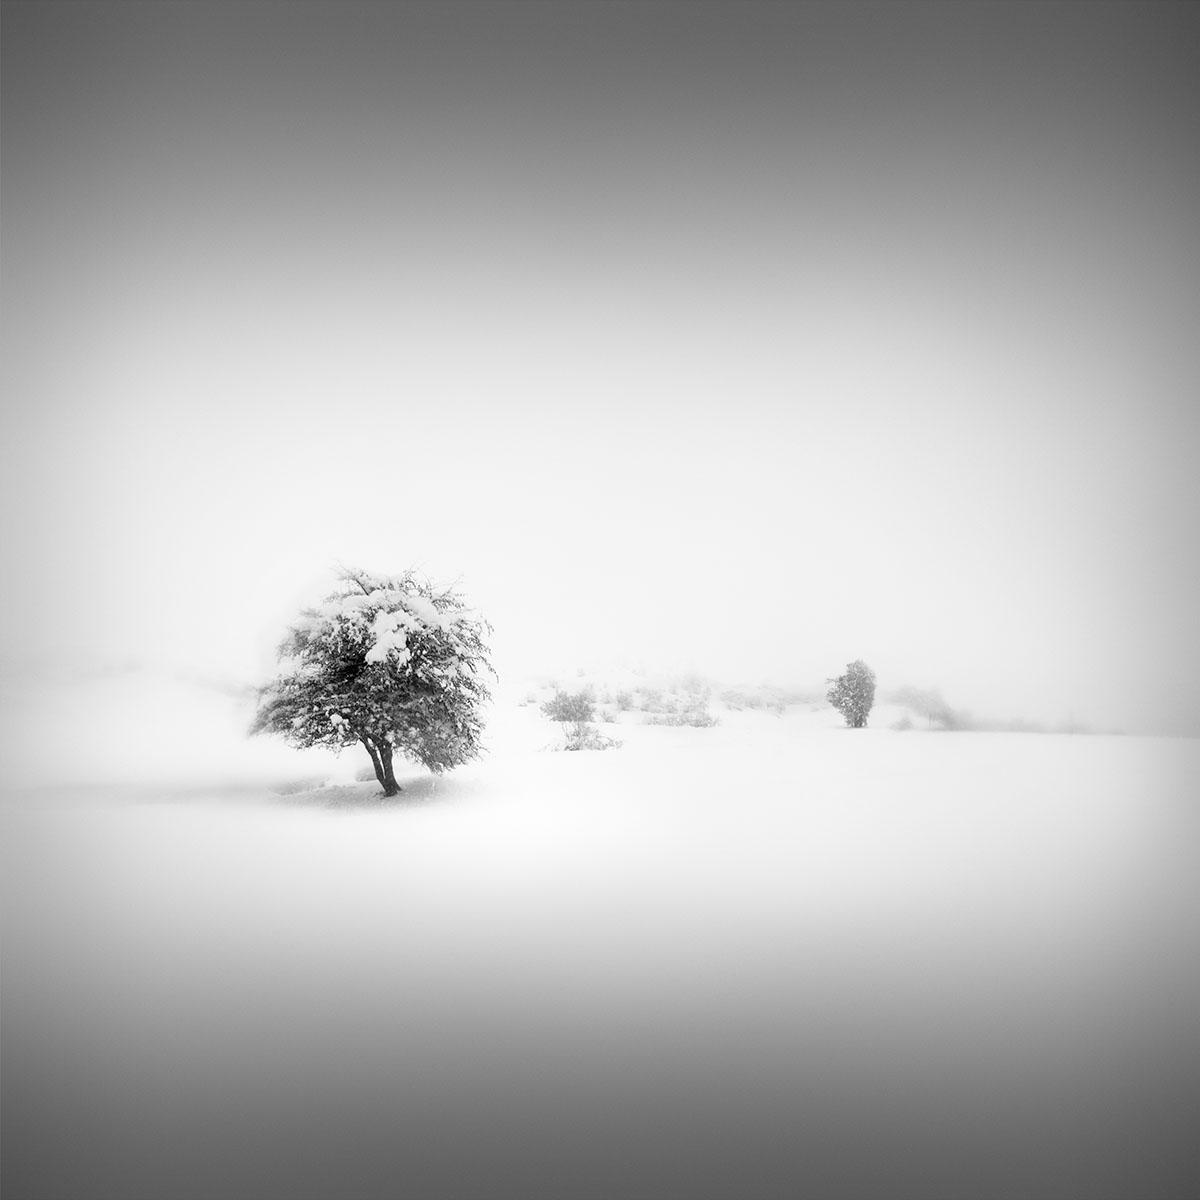 Catharsis IV - Spellbound © Julia Anna Gospodarou 2013 - Image Vision and Realization Catharsis IV